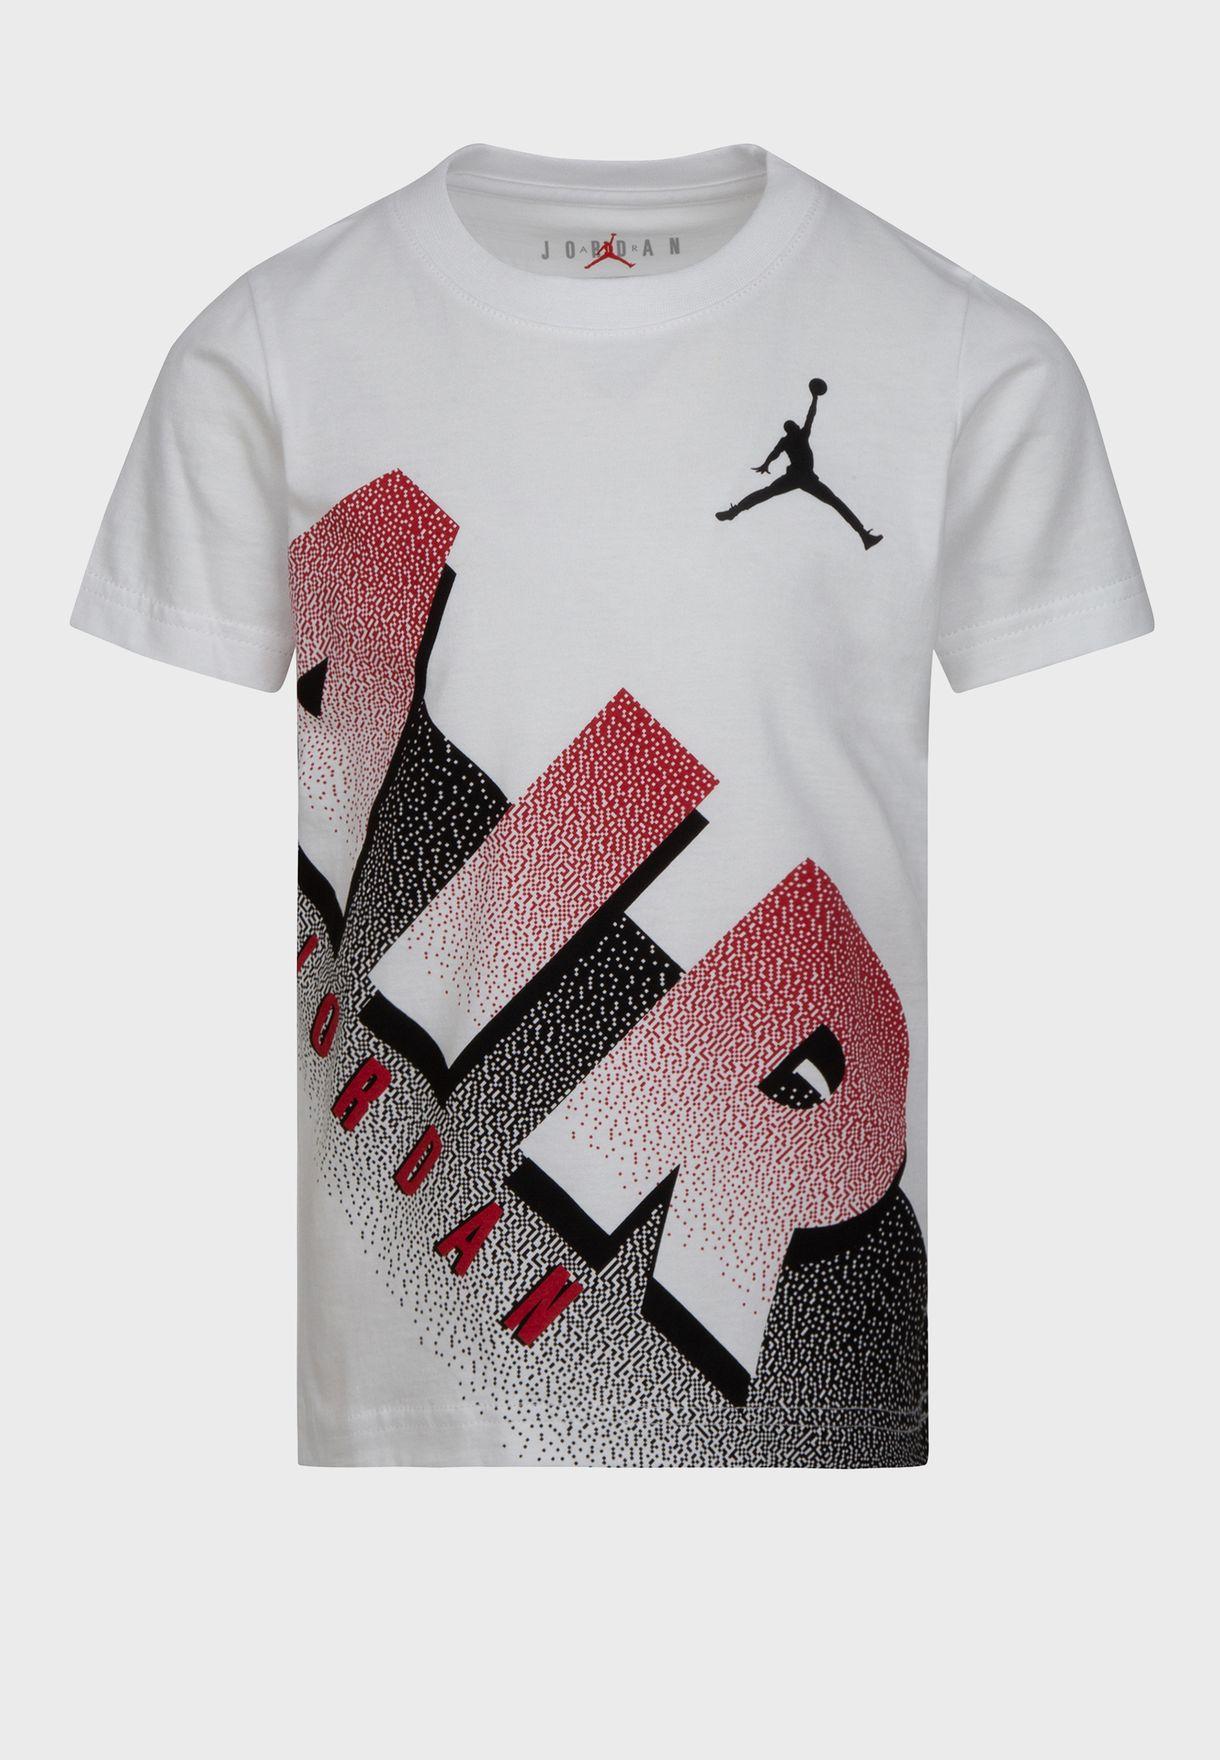 Kids Jordan Air Mezzo T-Shirt